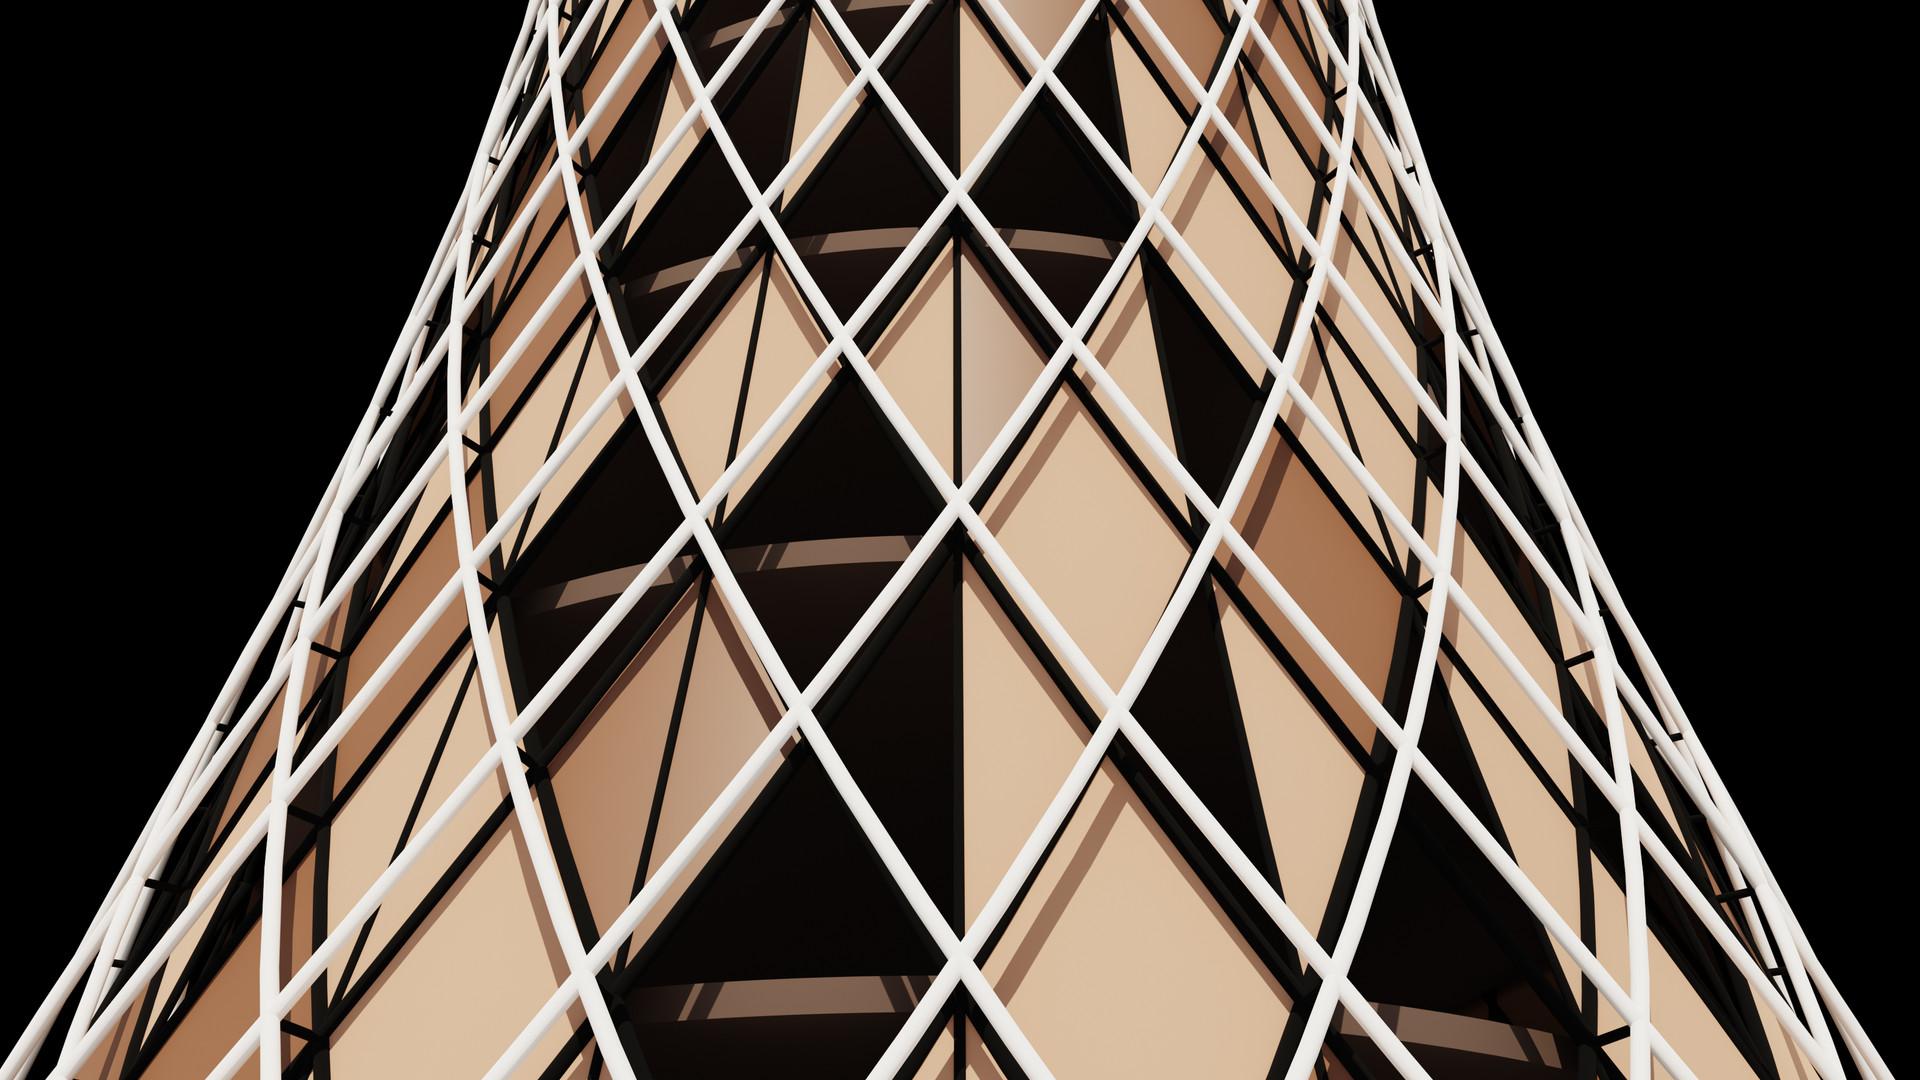 Parametric Tower